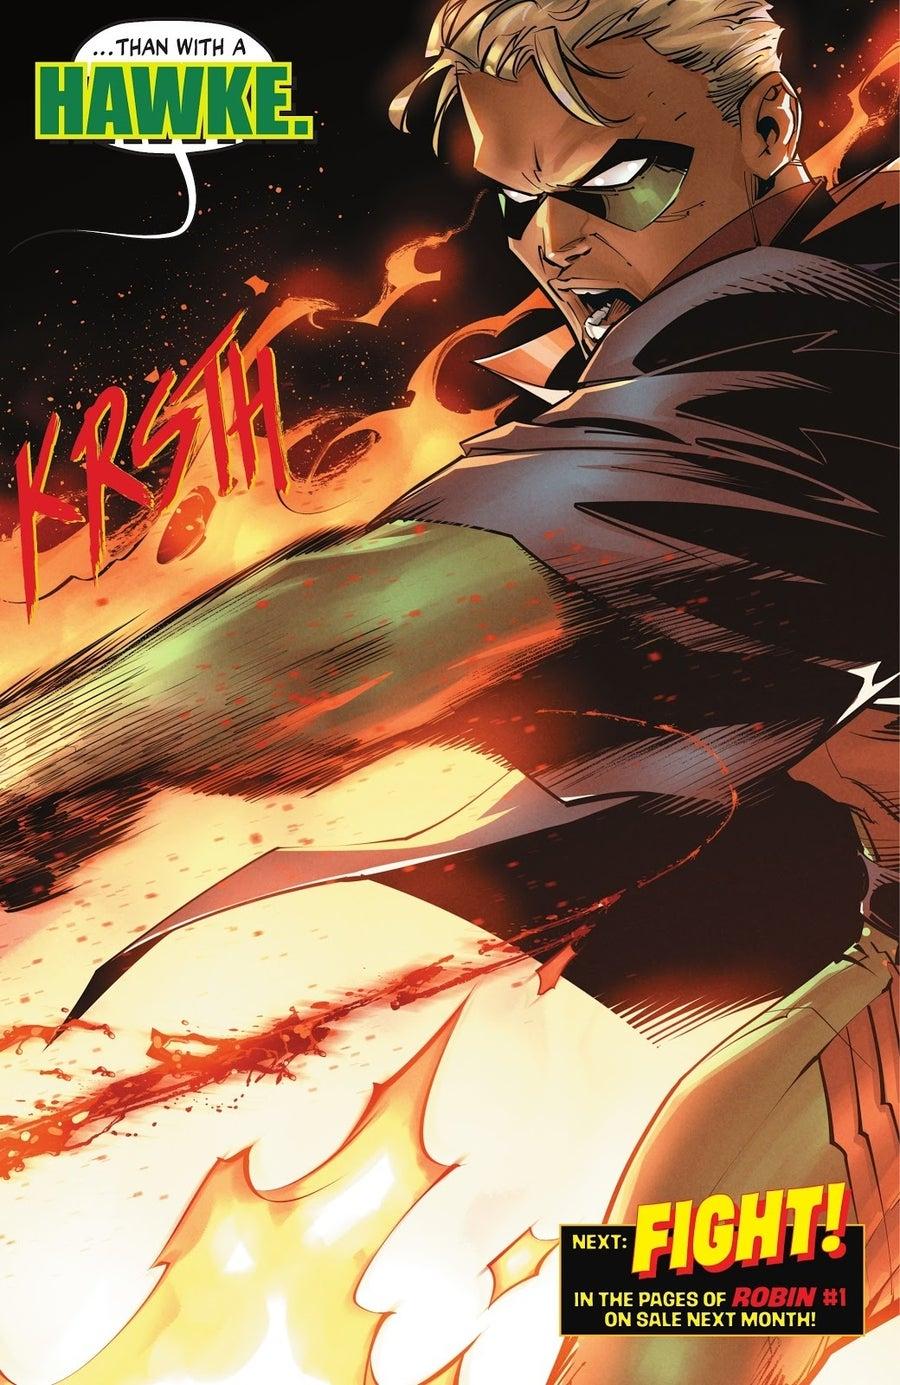 detective comics 1034 connor hawke return